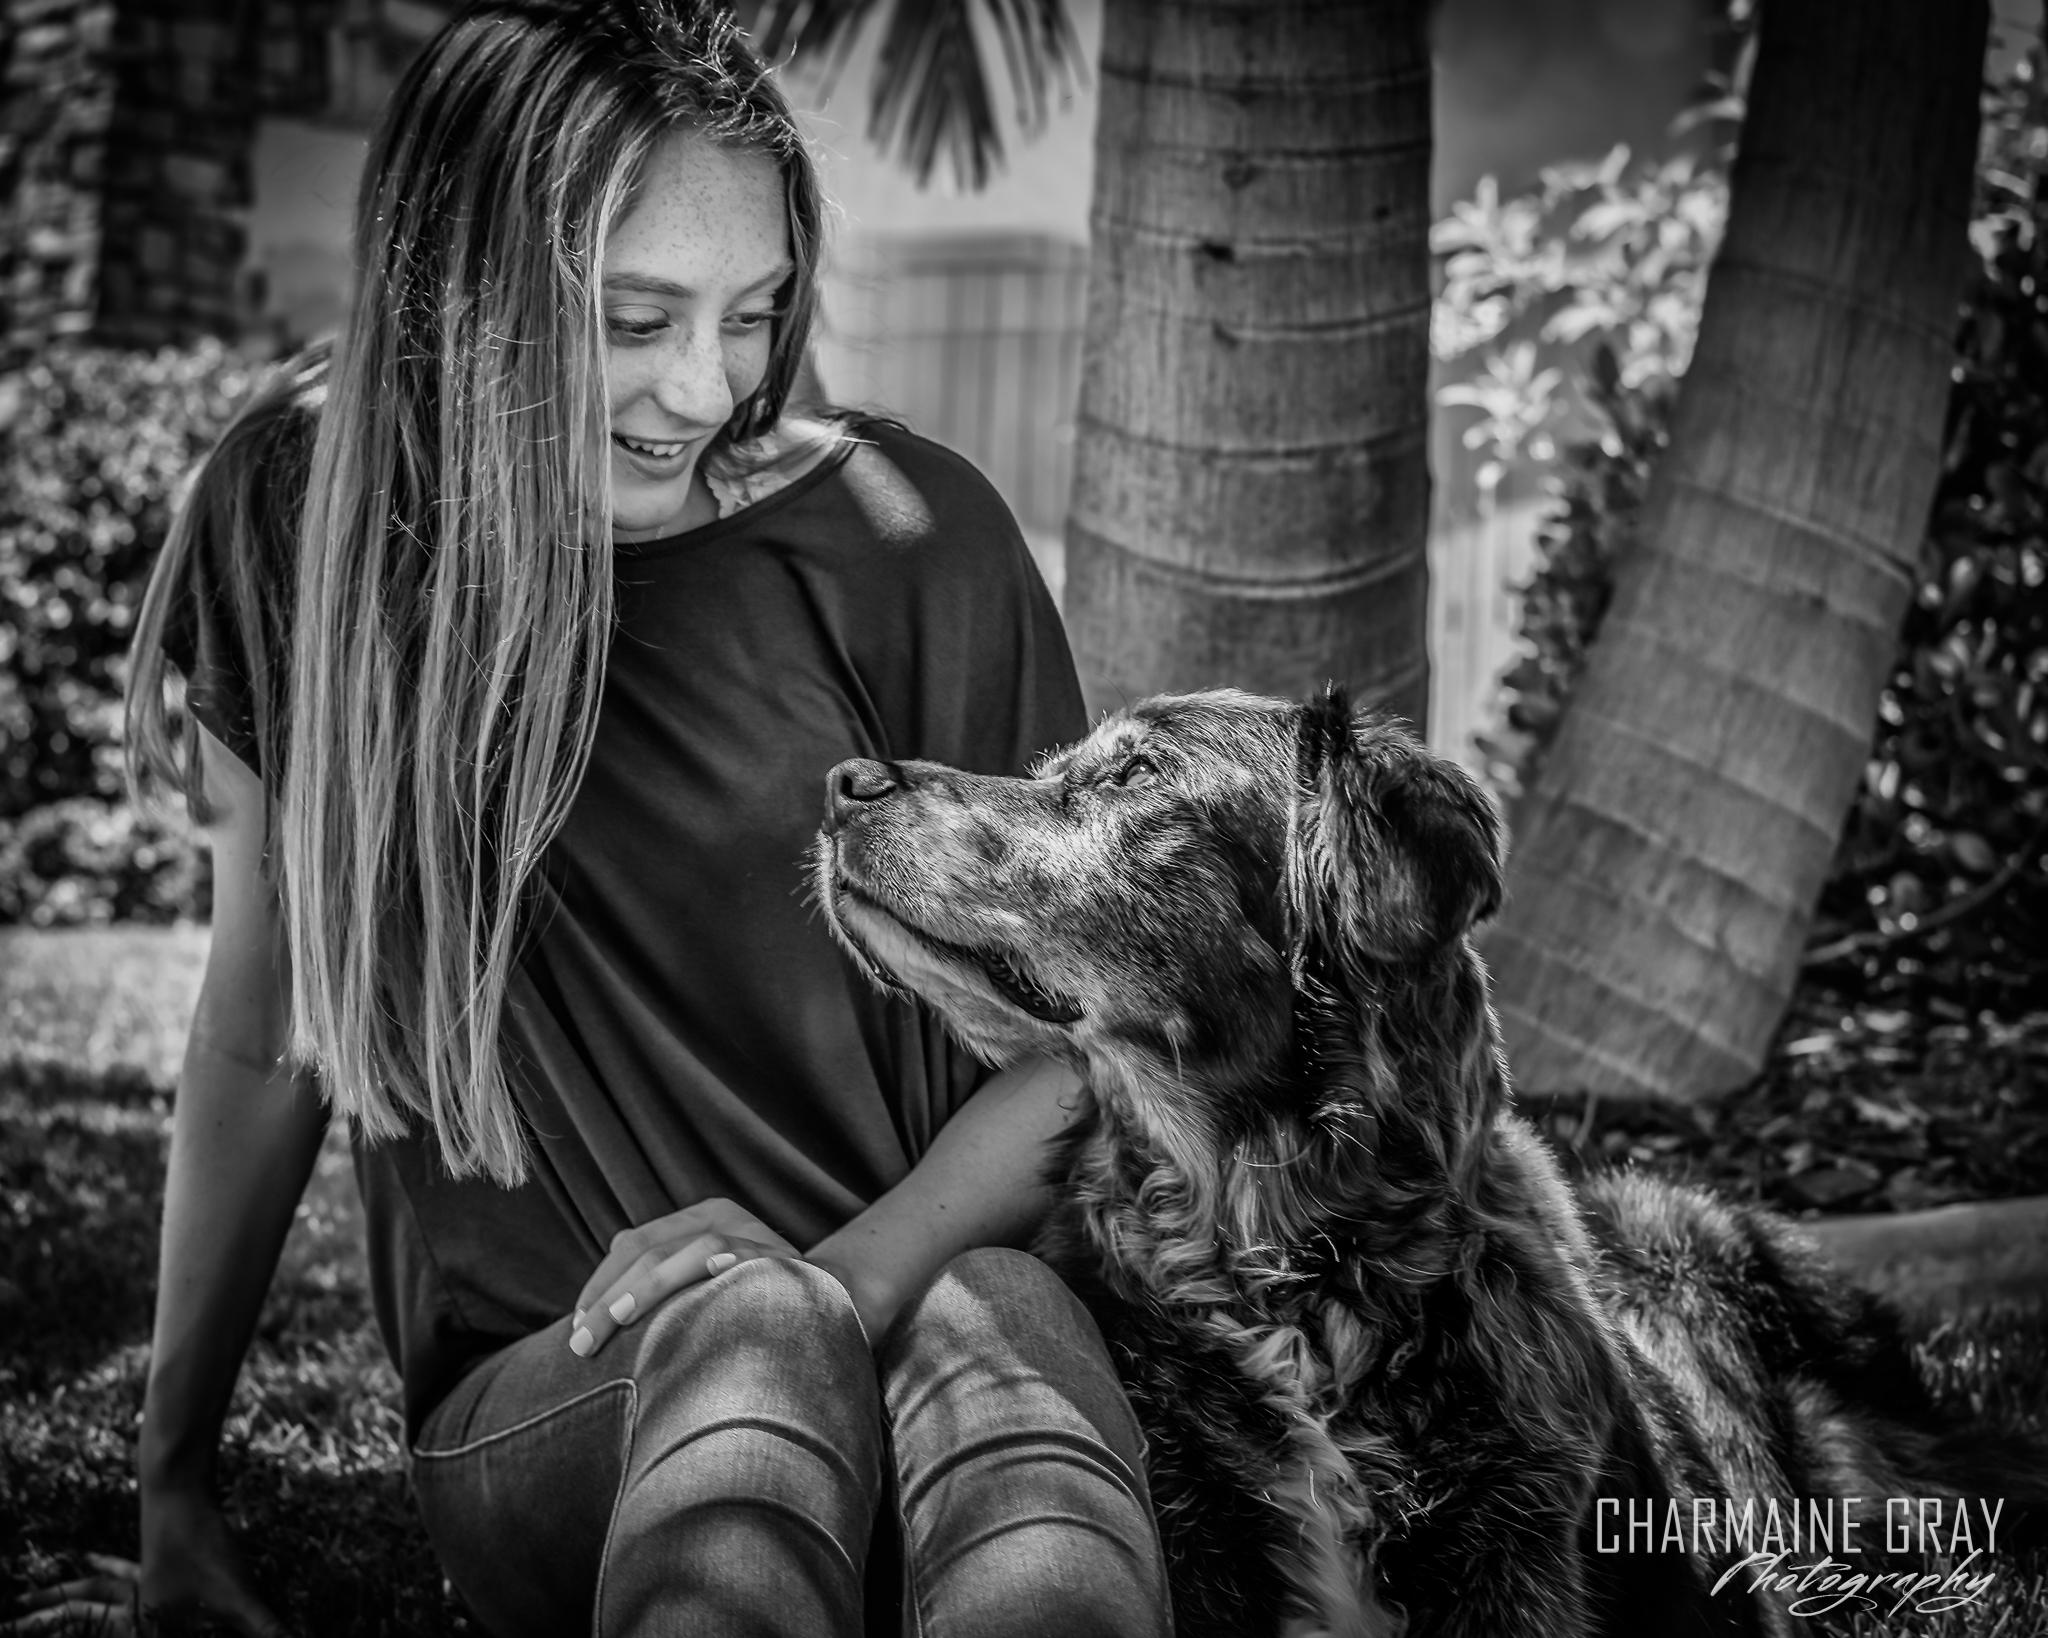 pet photographer, pet photography, pet portrait, pet, animal, charmaine gray photography, charmaine gray pet photography, san diego,flat coated retreiver,dog